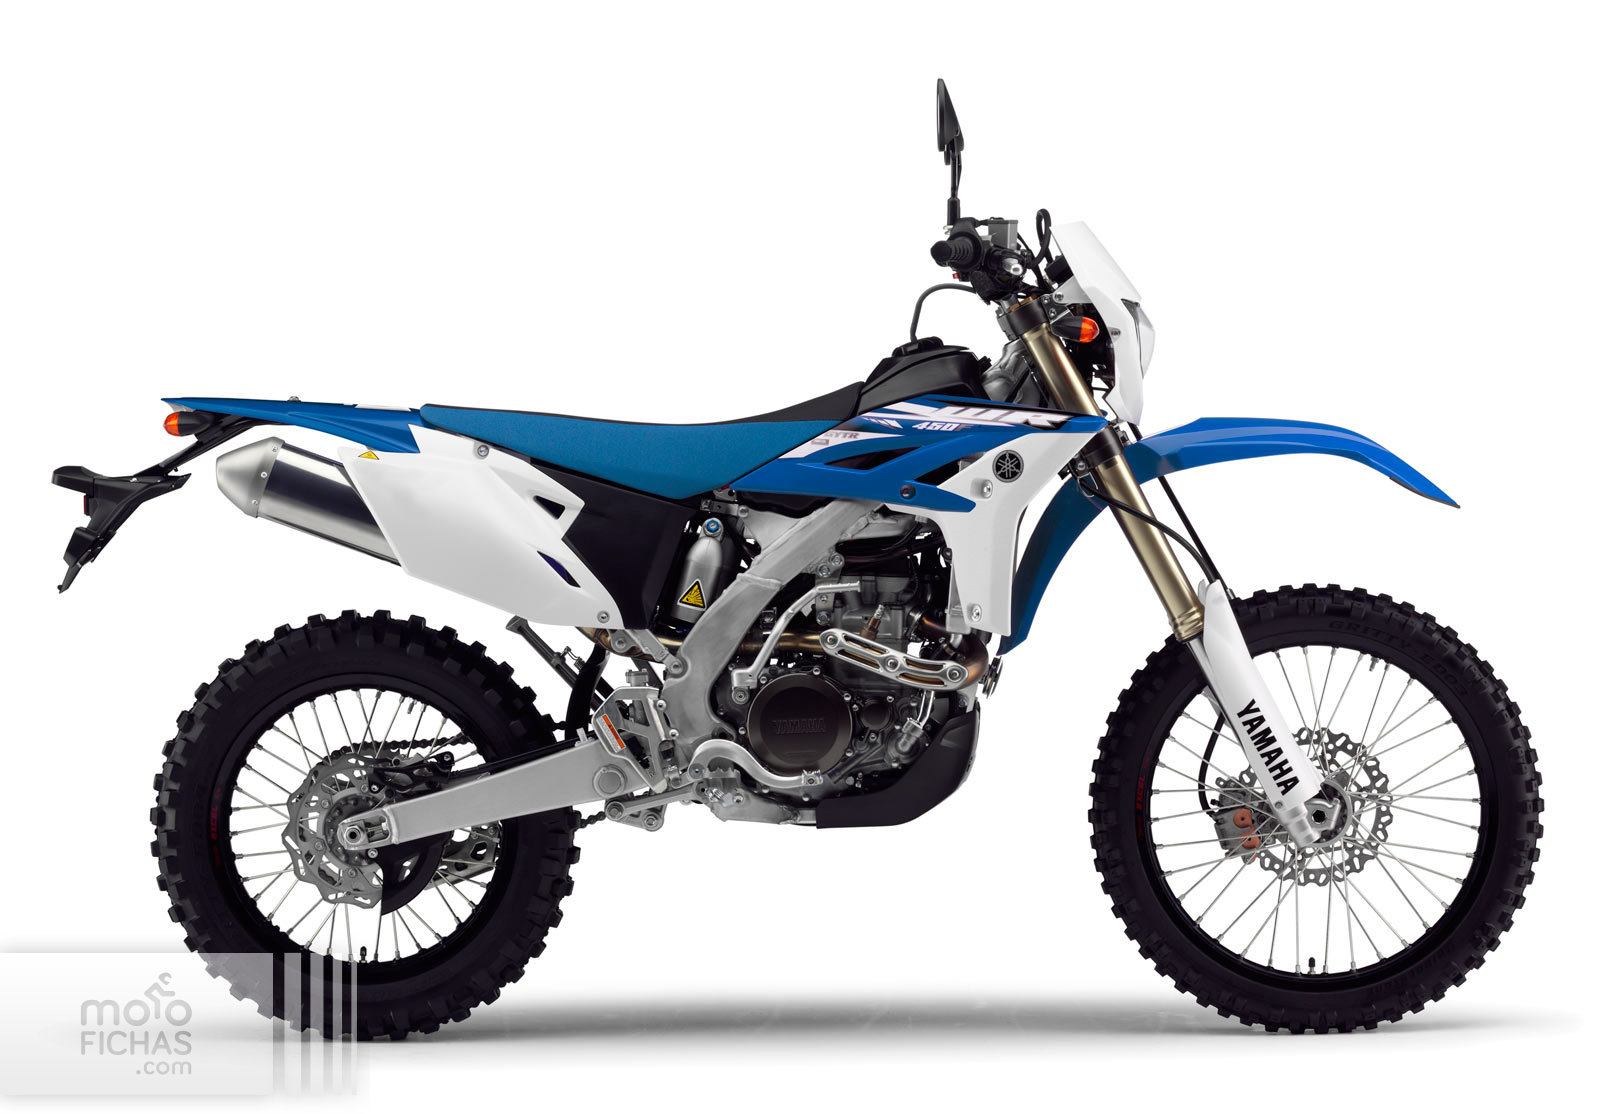 Yamaha wrf 450 - Off Road Bike Trader